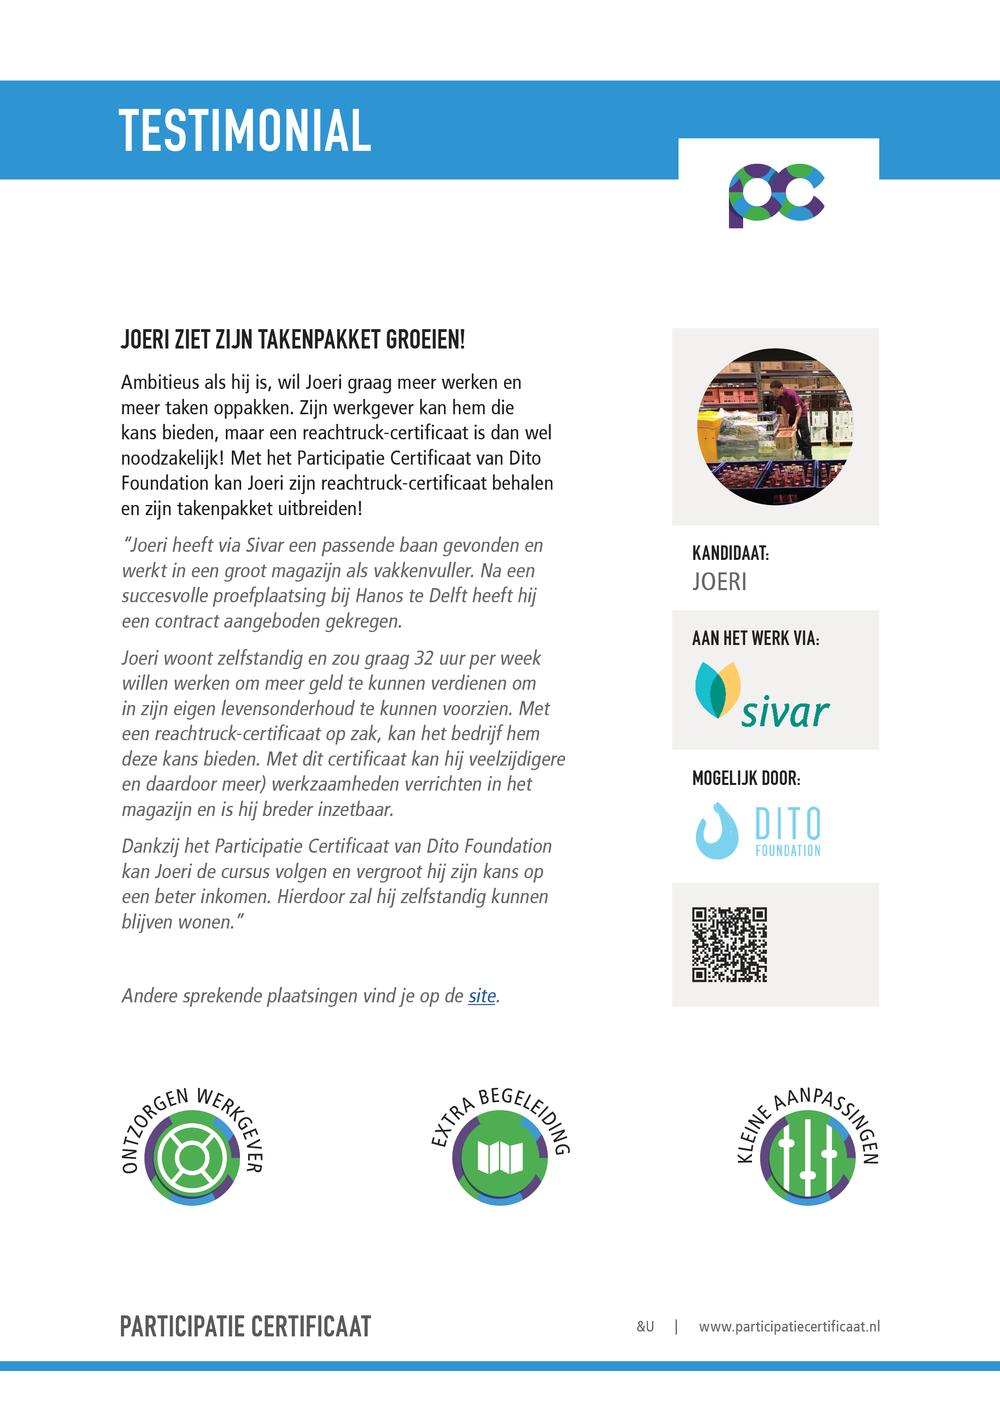 PC Dito Foundation - testimonial Joeri (1).png